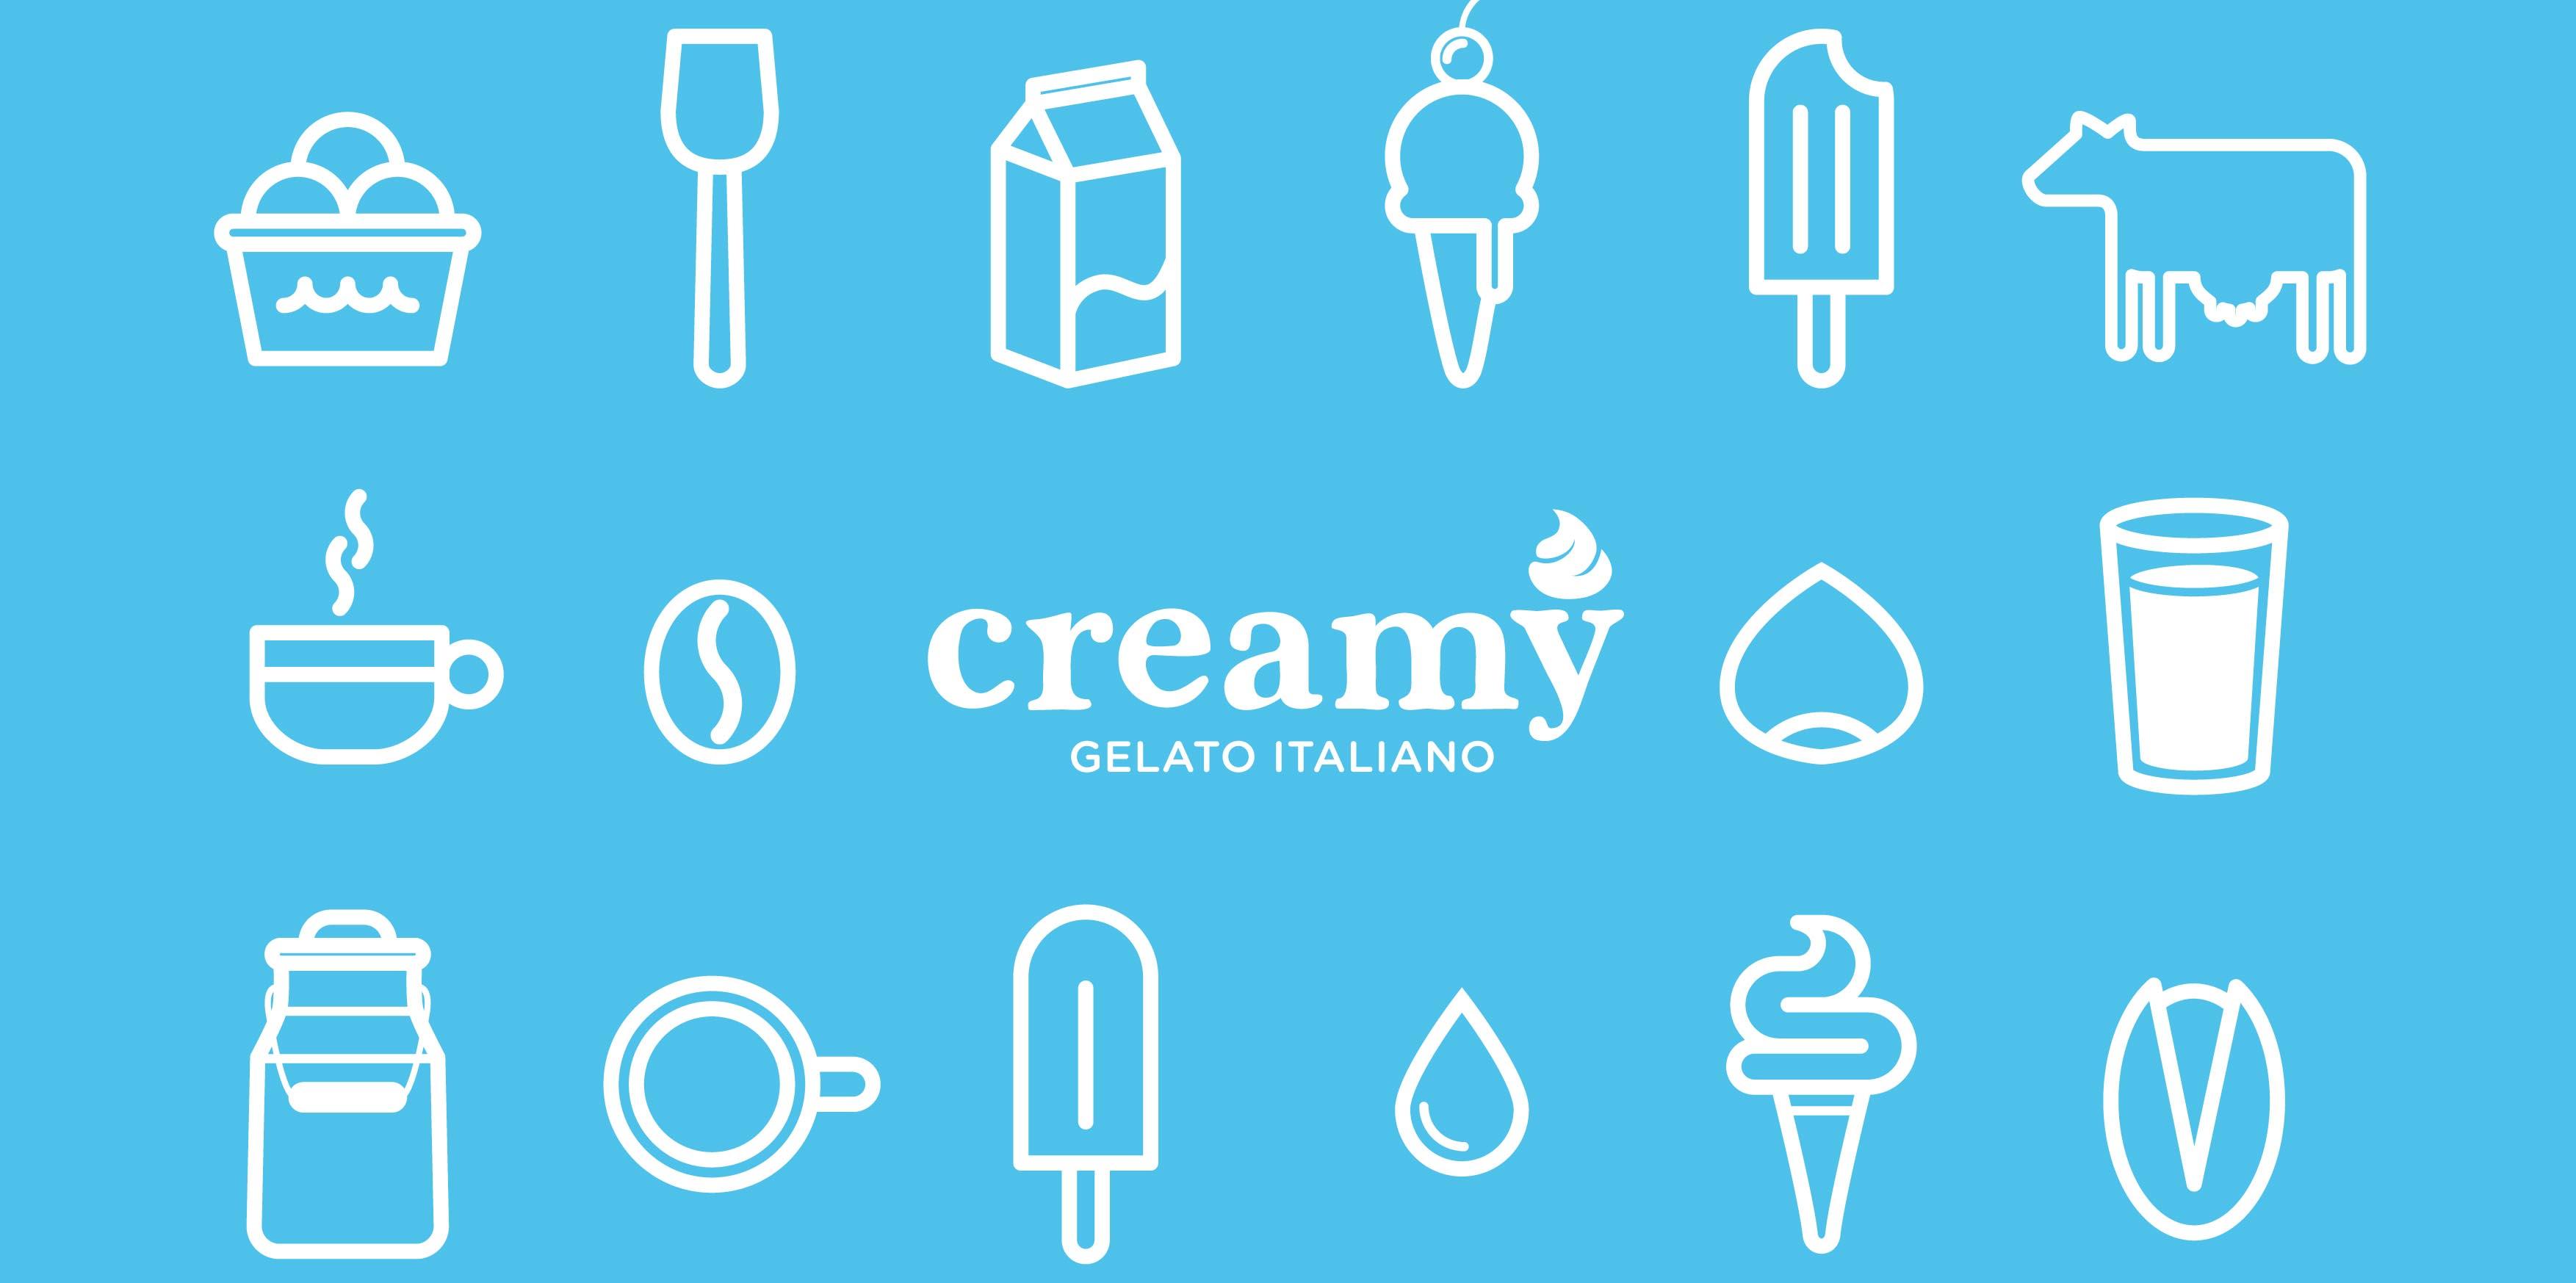 Icone Creamy